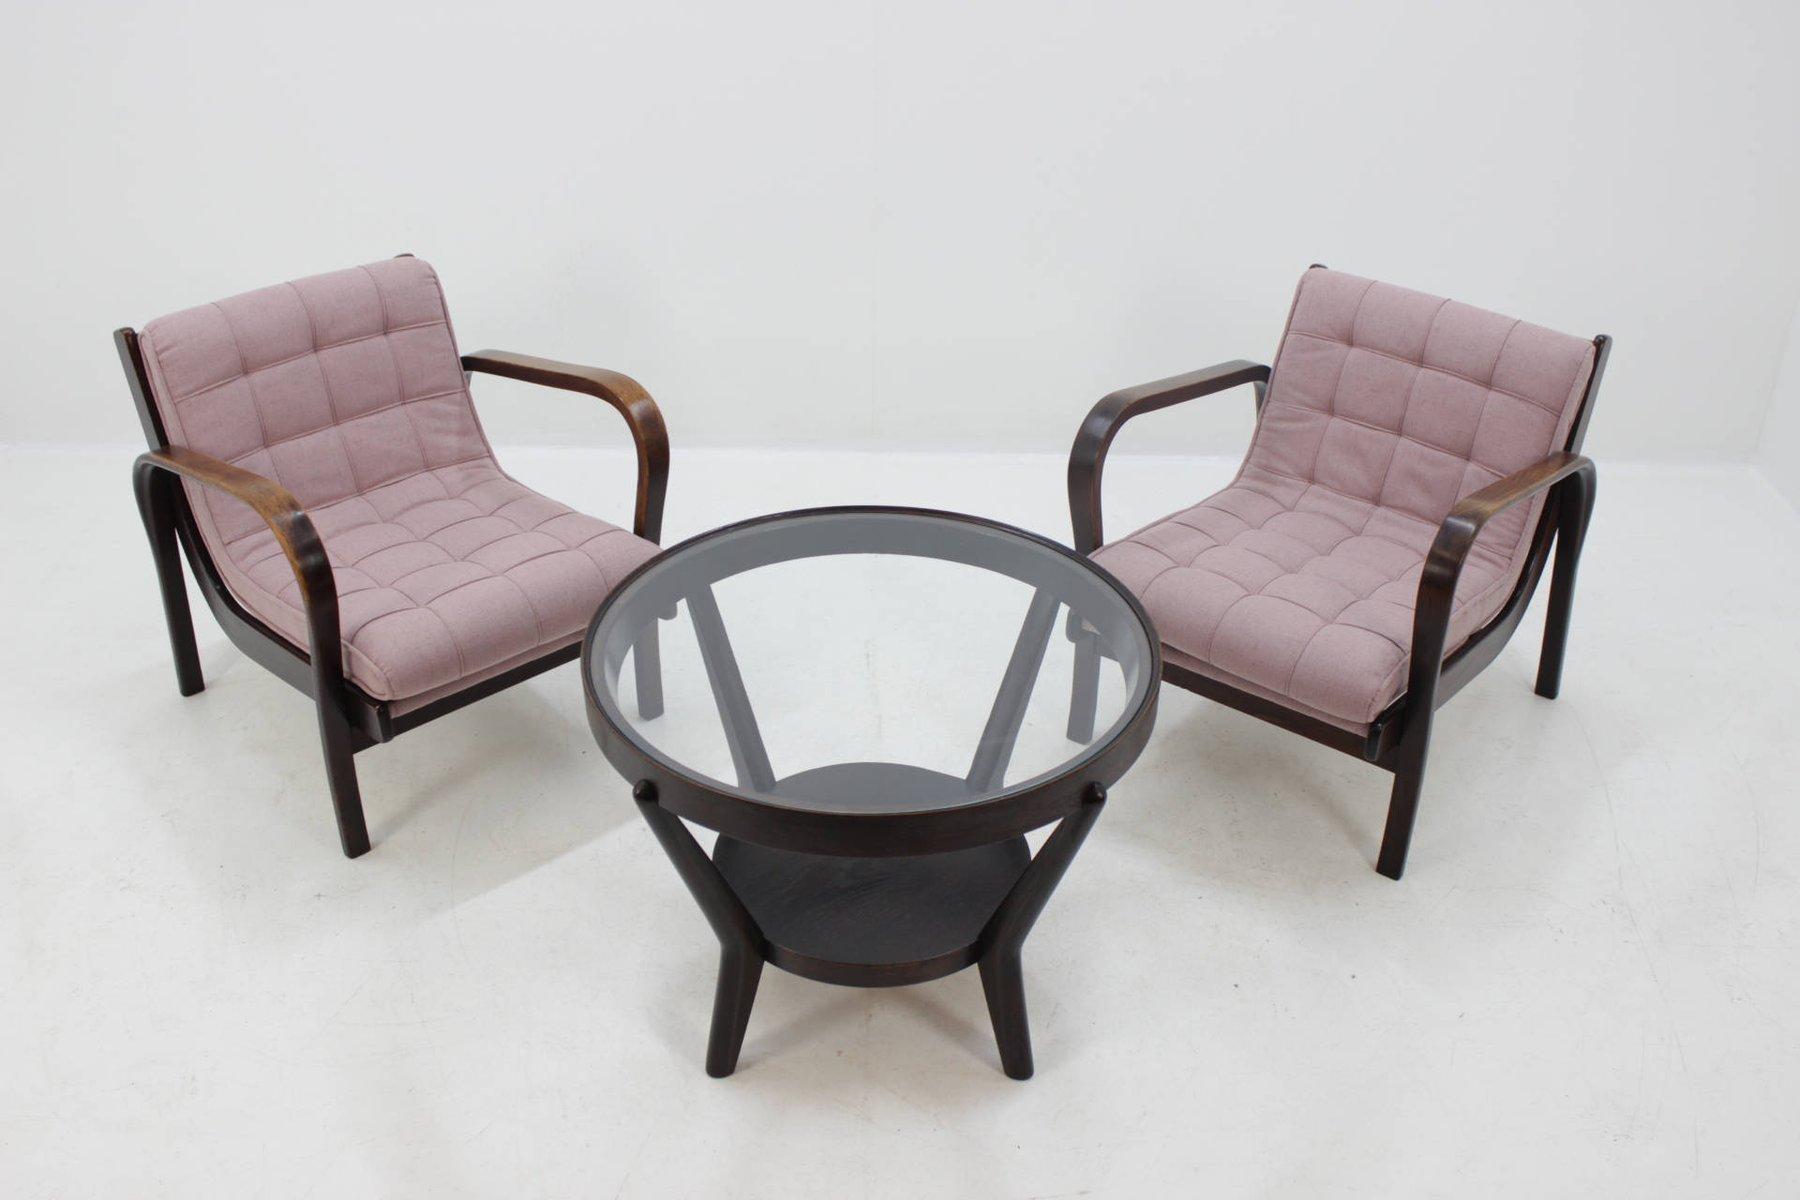 Lounge Chairs U0026 Coffee Table Set By A. Kropáček And K. Koželka For Interier  Praha, 1960s For Sale At Pamono